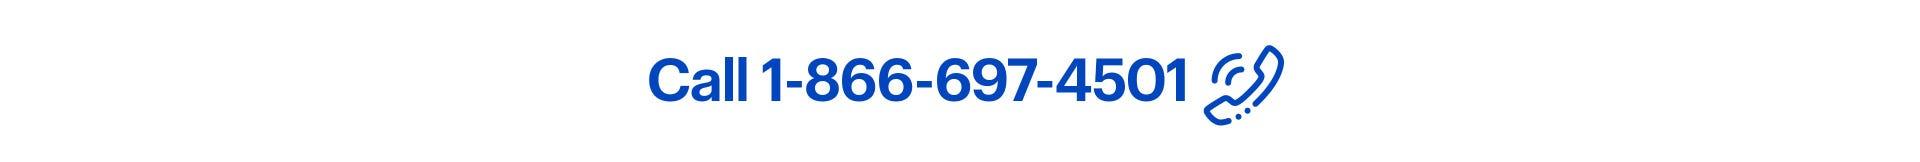 Call 1-866-697-4501